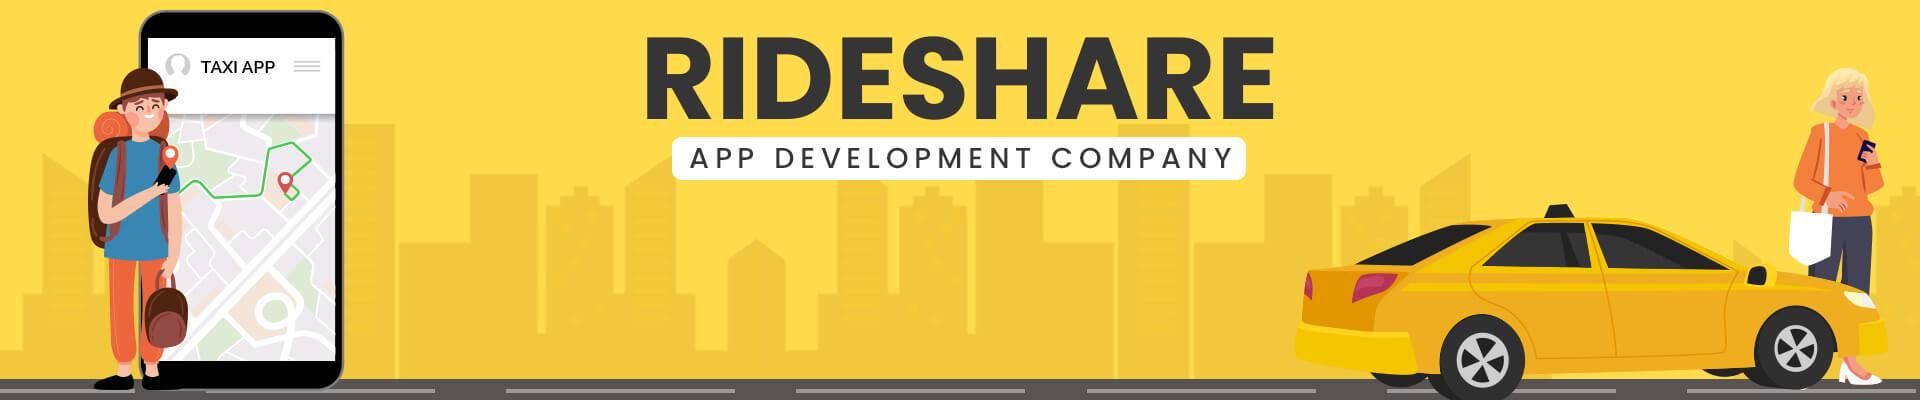 Best RideShare App Development Company   RideShare App Developers For Hire